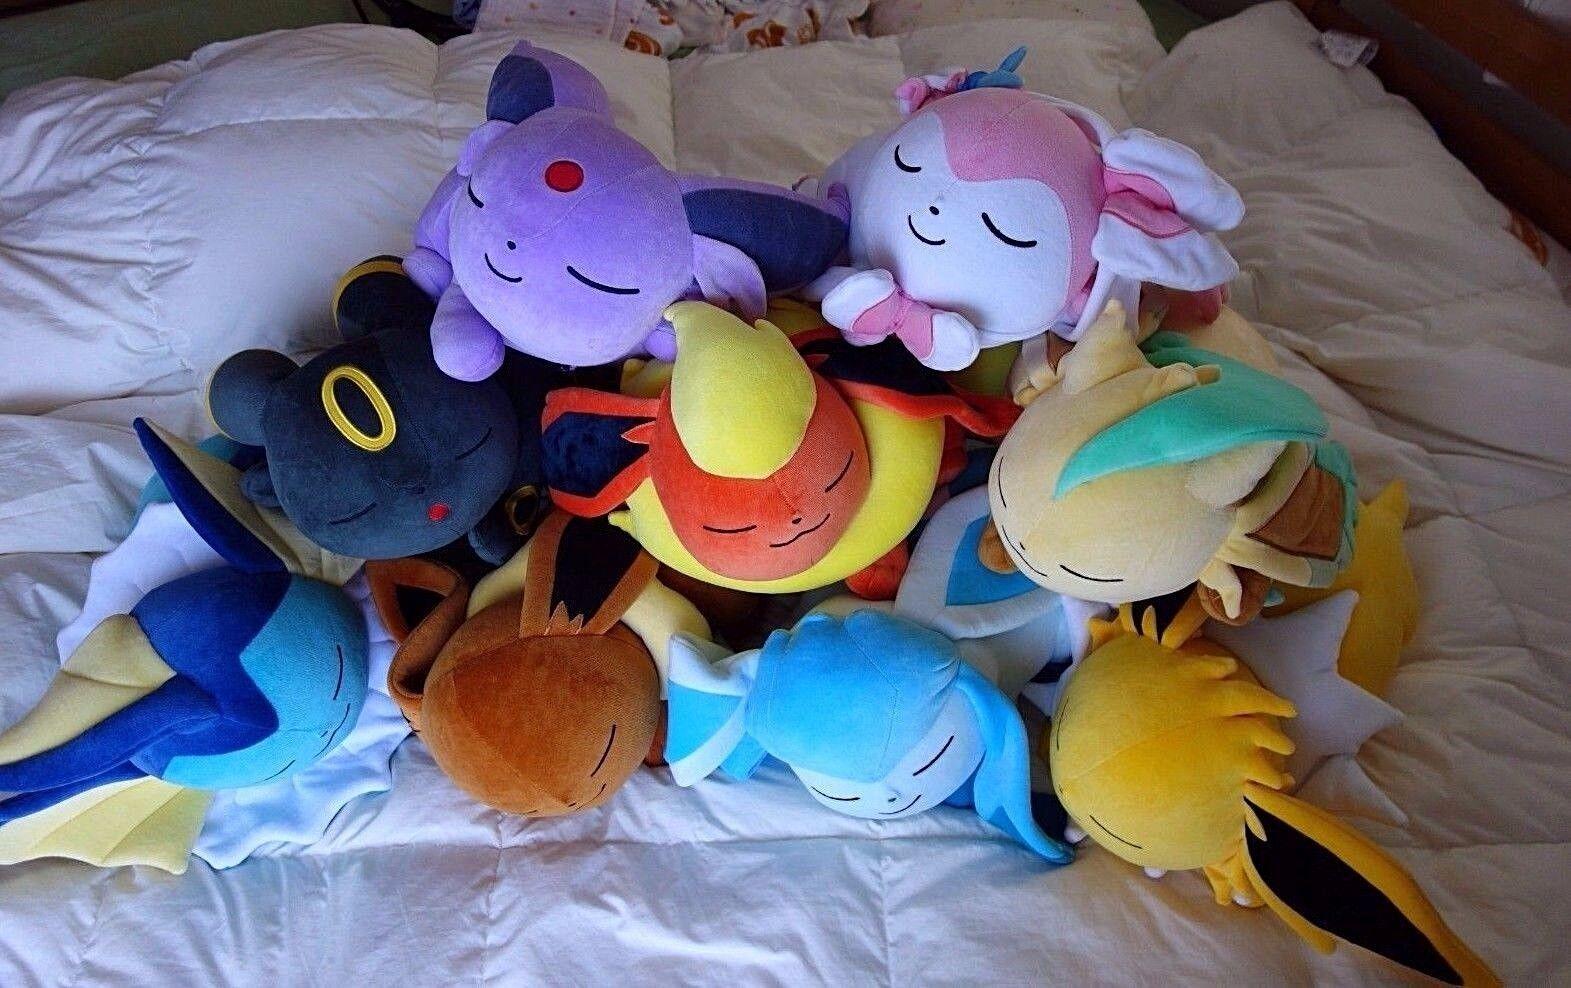 Espeon eeVee  2018 Pokemon Center Ltd Suyasuya Sleeping Espeon Poké Plush